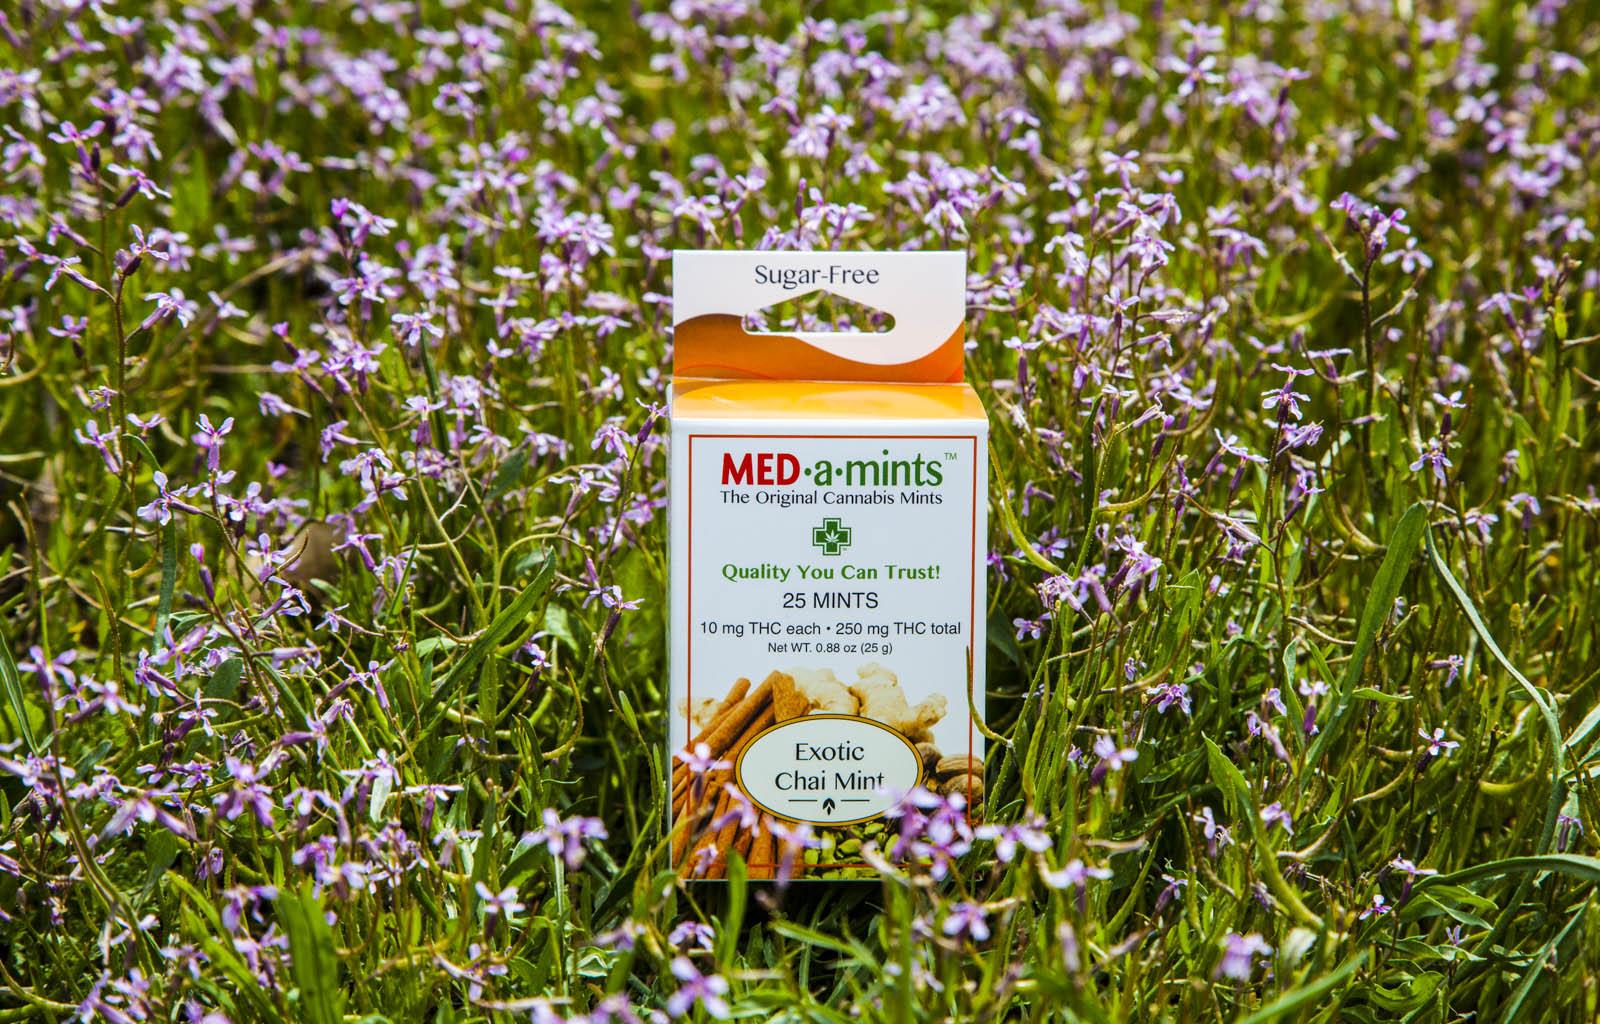 medamints-potent-thc-cannabis-marijuana-mints-021